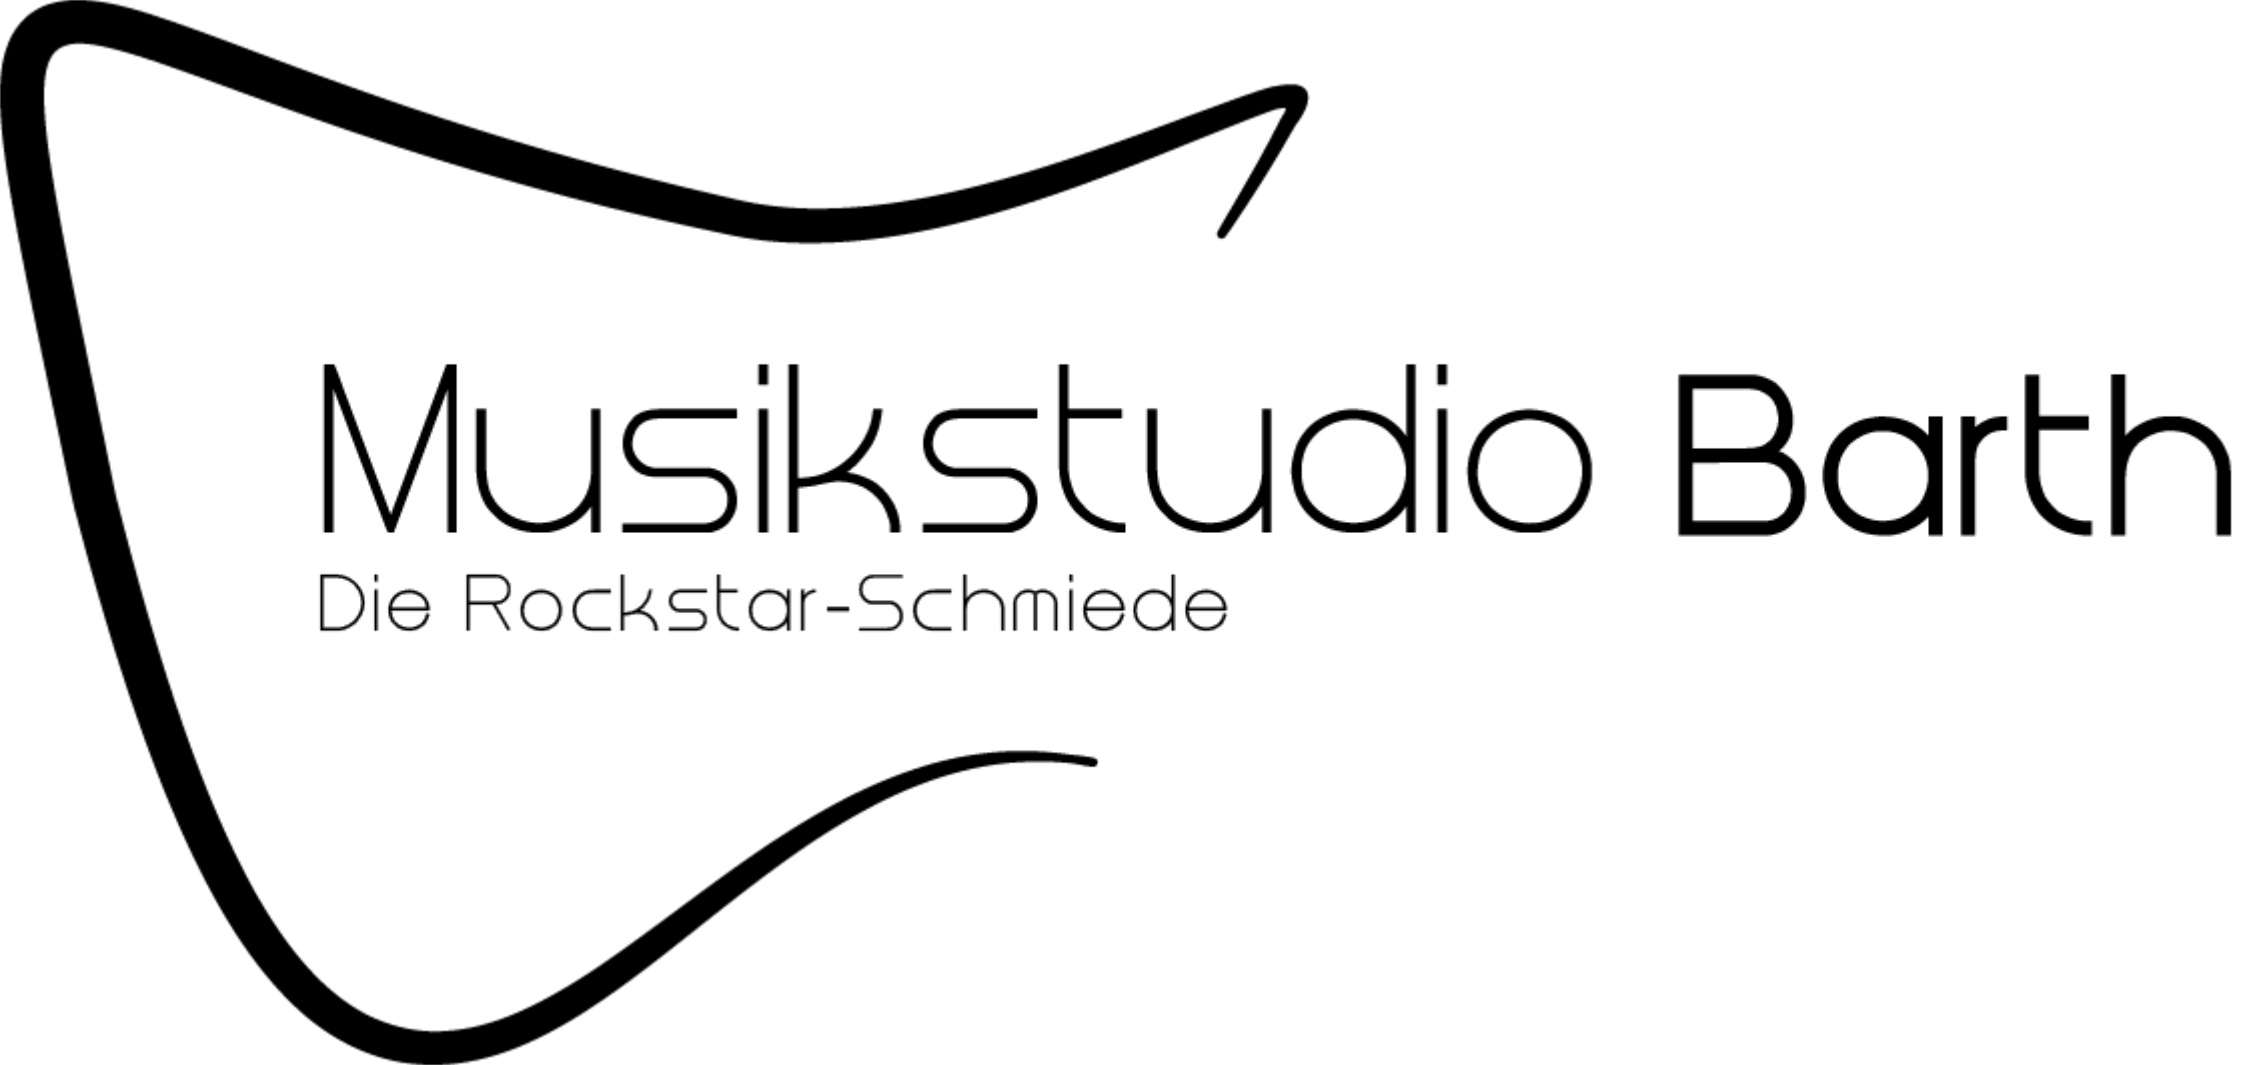 Onlineschool for Music by Musikstudio Barth